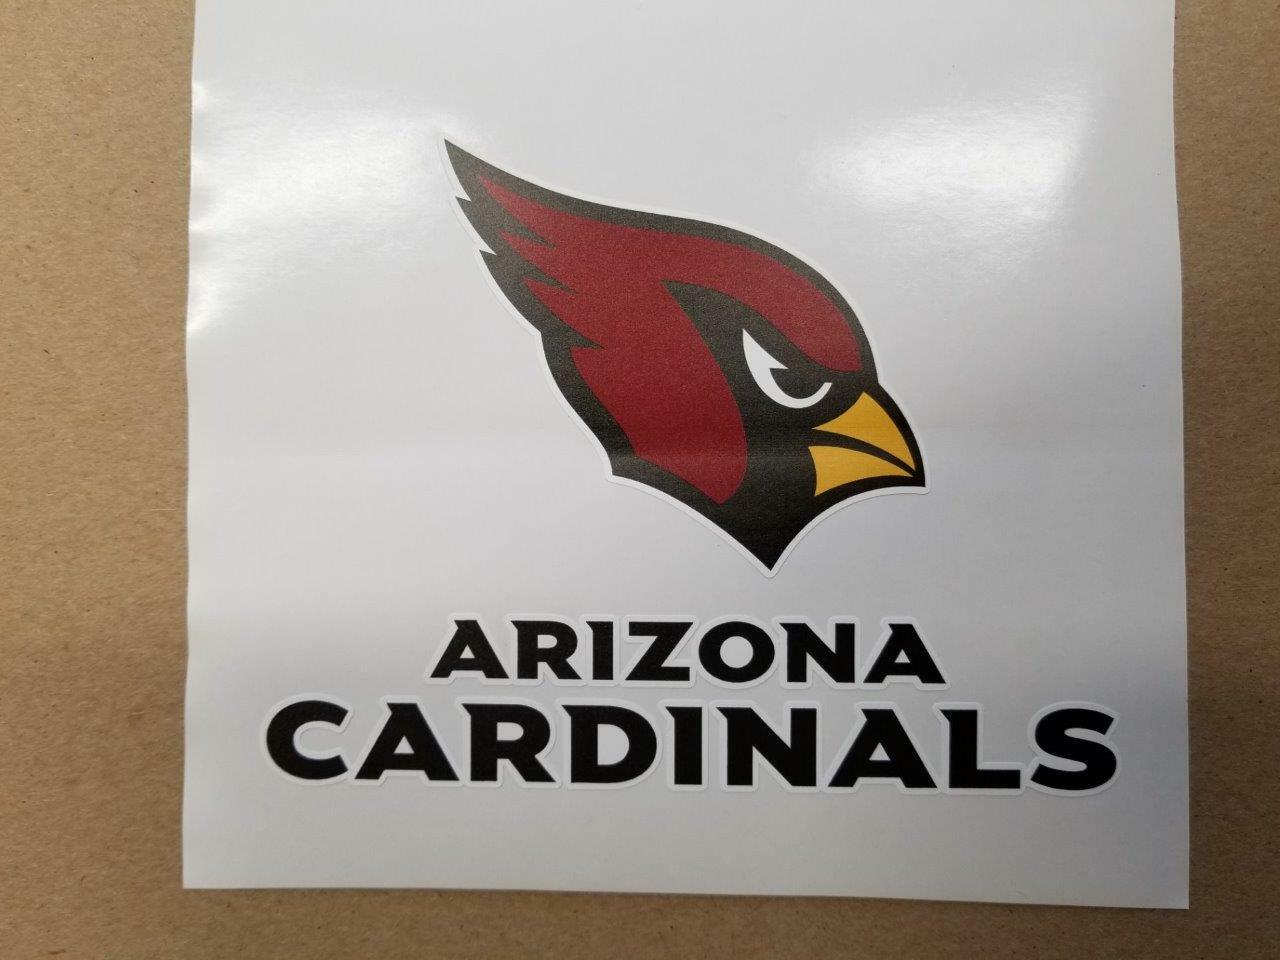 Arizona  Cardinals cornhole board or vehicle decal(s)AC3  very popular